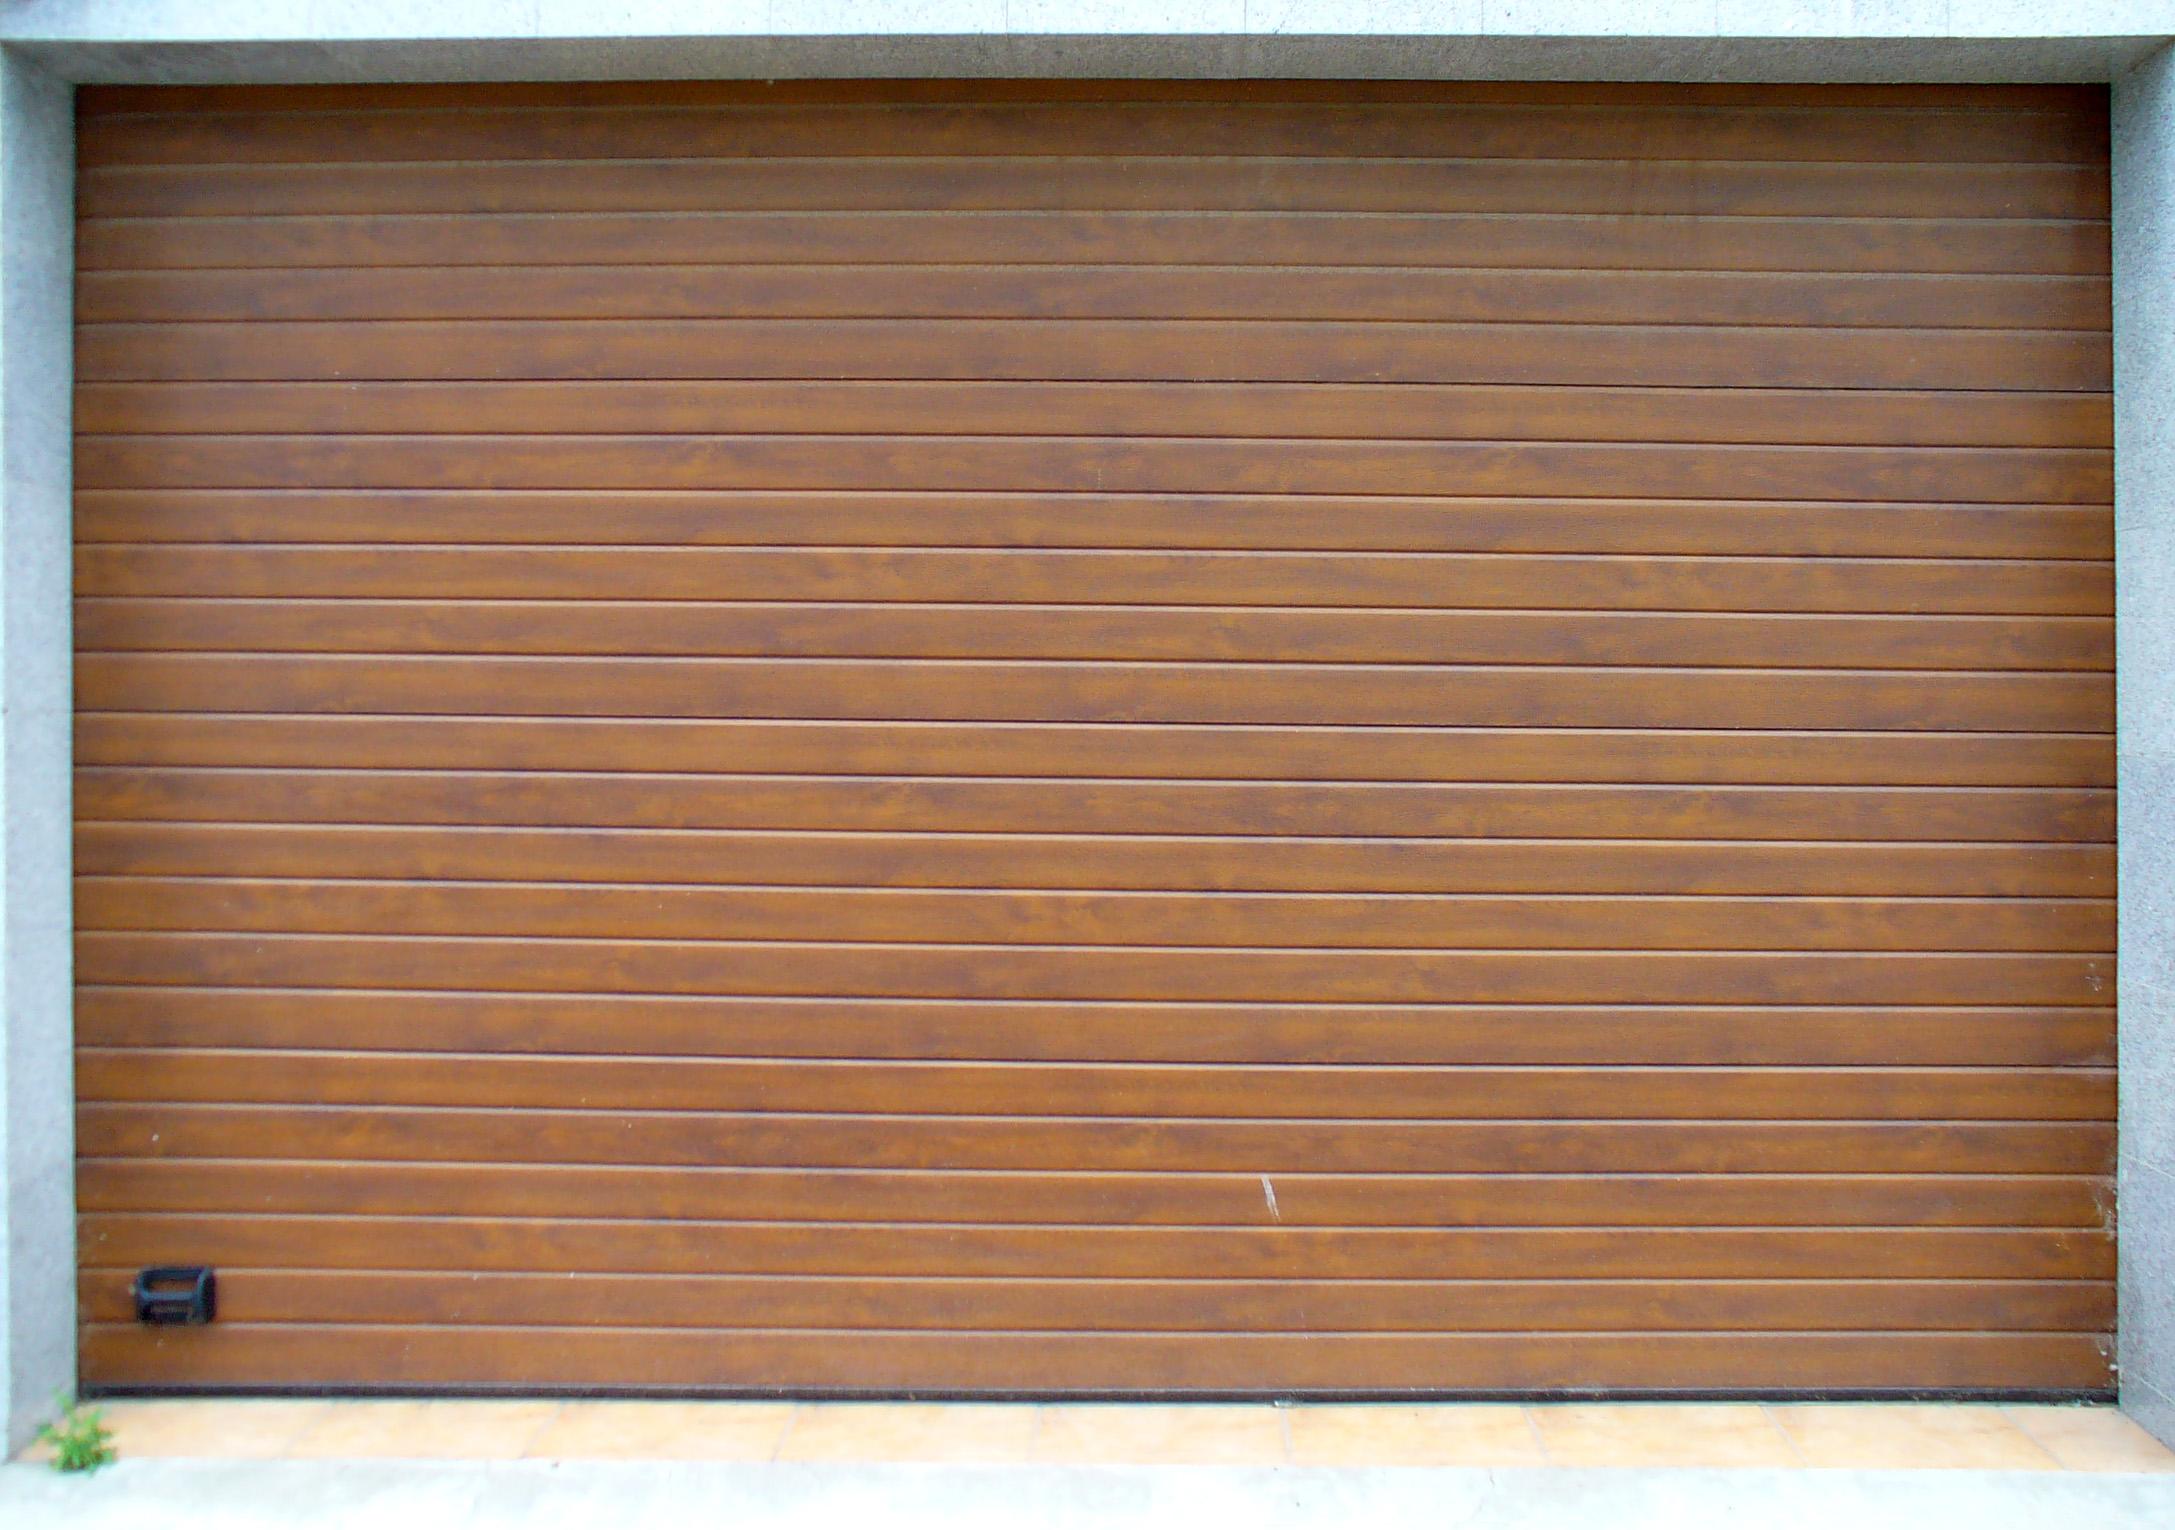 1530 #442C1A Usi Garaj Sectionale image Usa Garage Doors 36132175